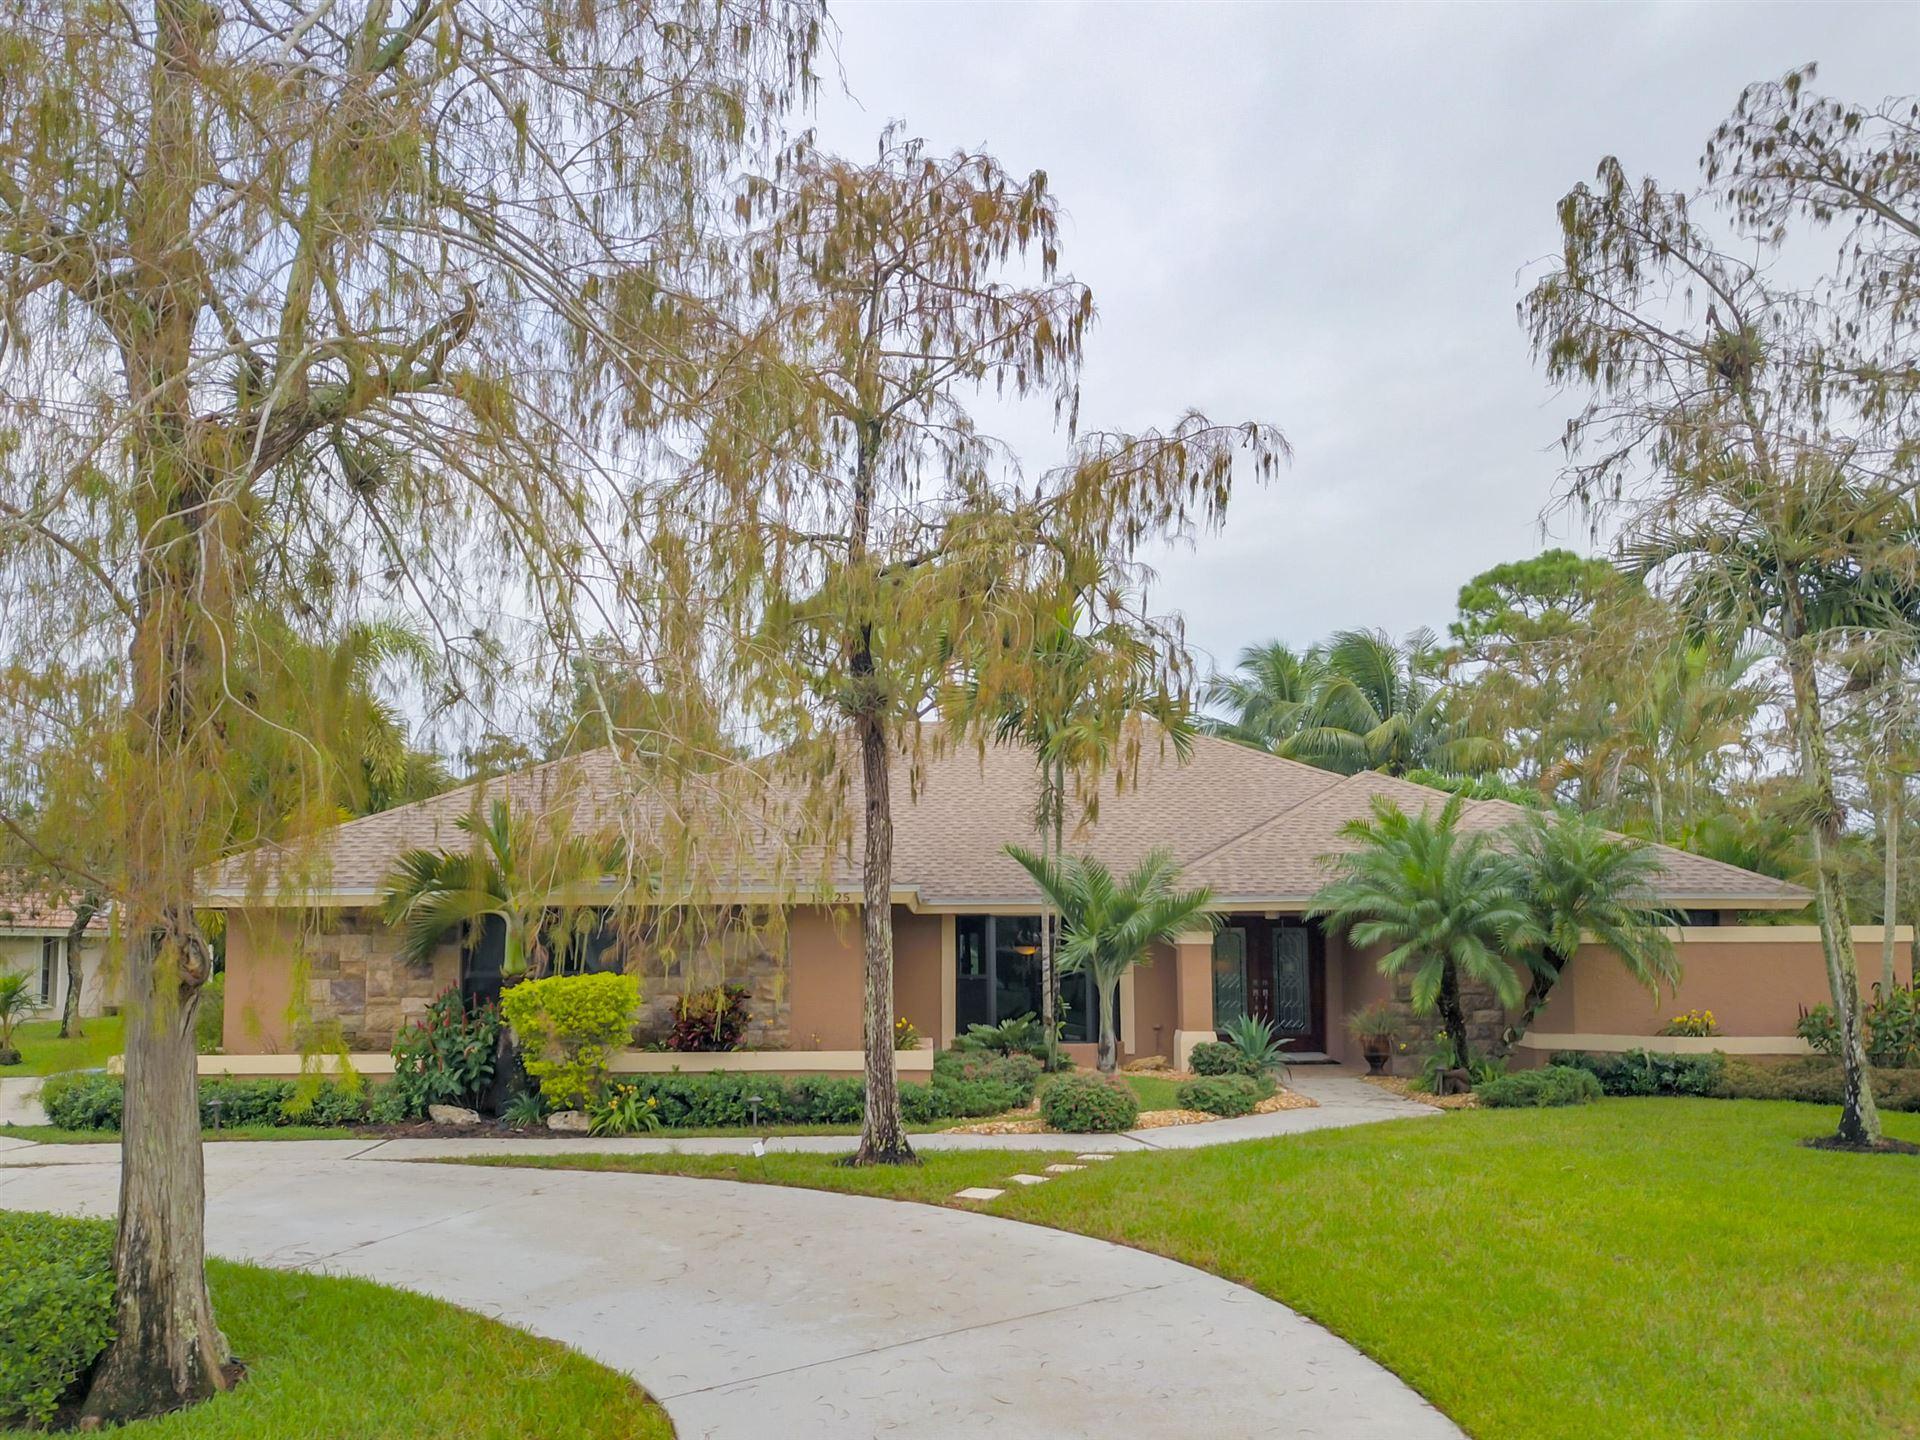 15225 Meadow Wood Drive, Wellington, FL 33414 - #: RX-10671781